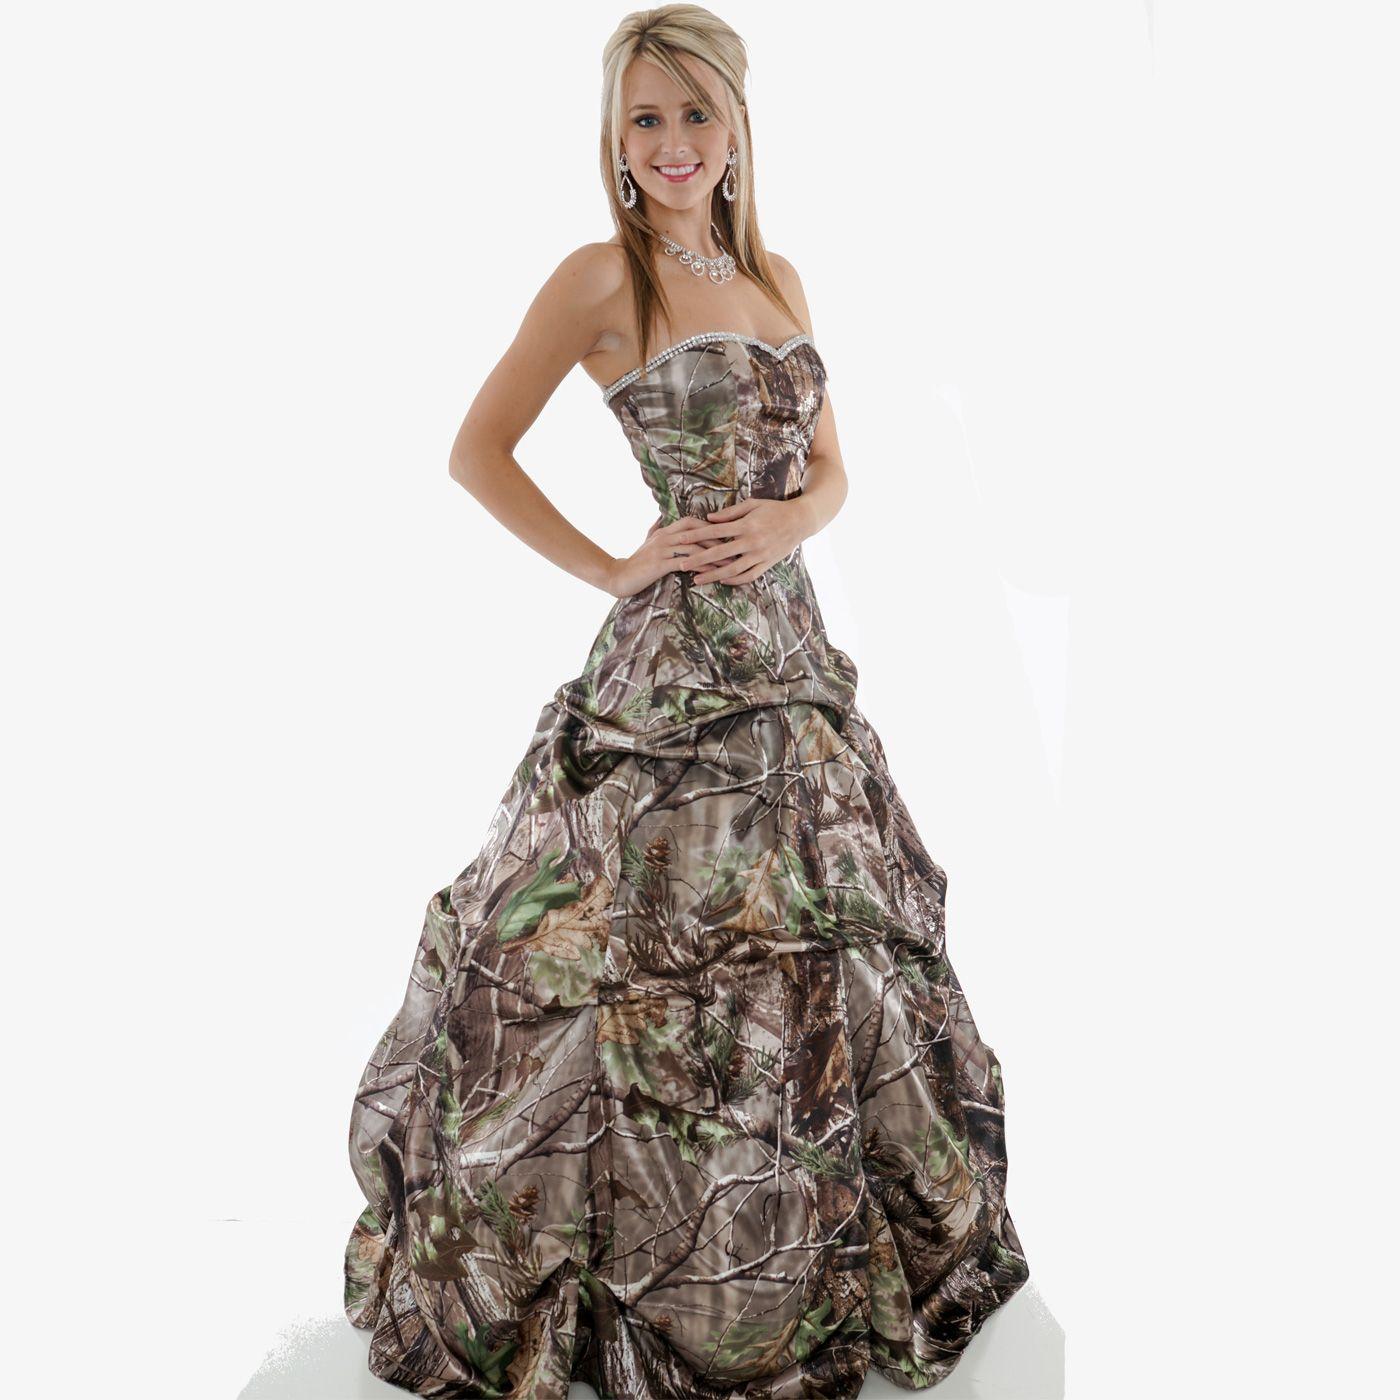 Blue camo wedding dresses  Realtree Camo Strapless Dress with Pickup Skirt and Rhinestone Trim